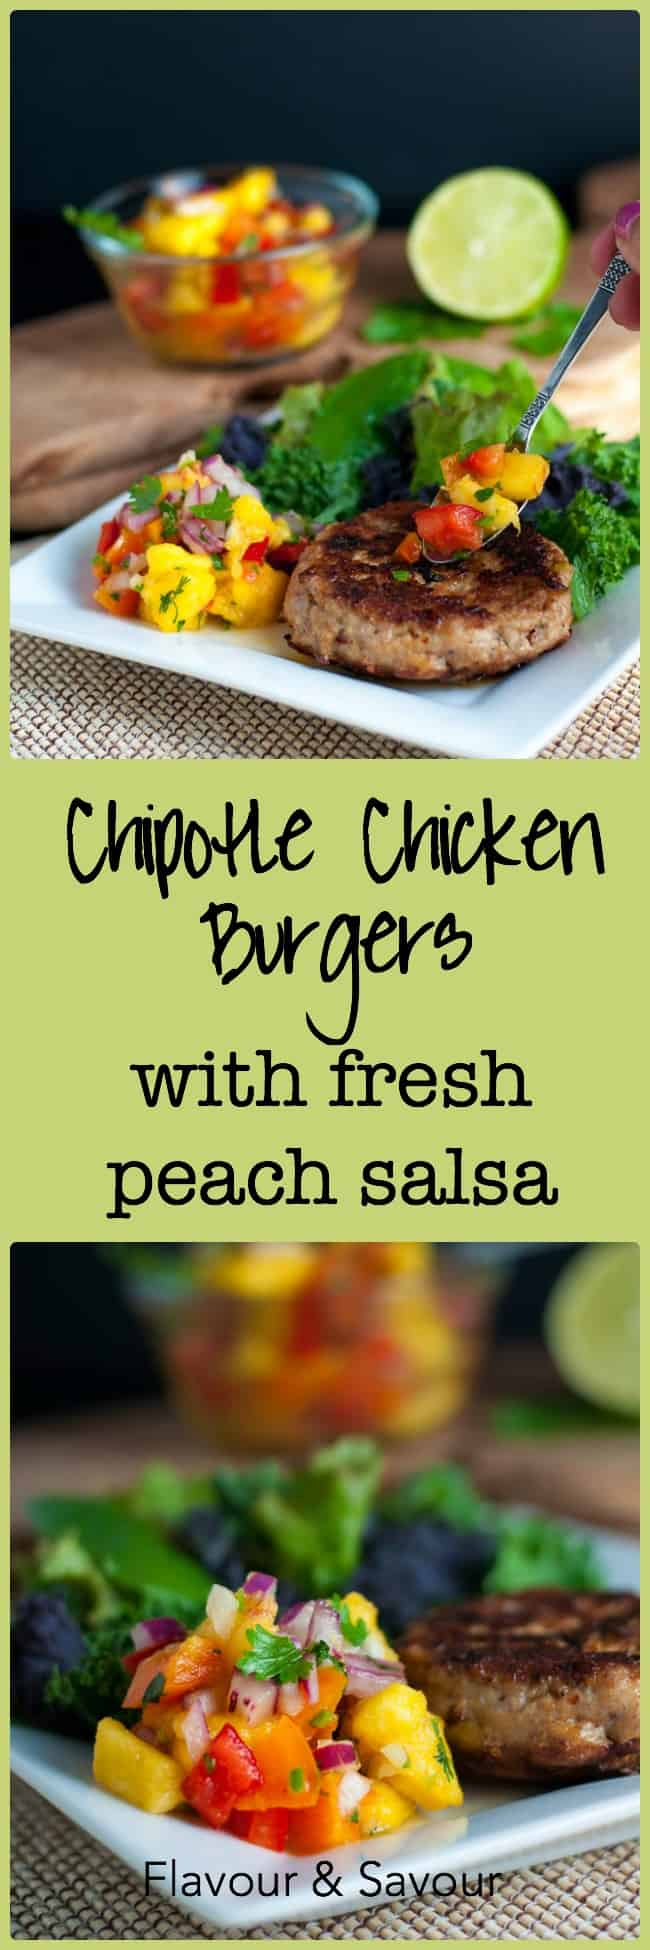 Chipotle Chicken Burgers with Fresh Peach Salsa.